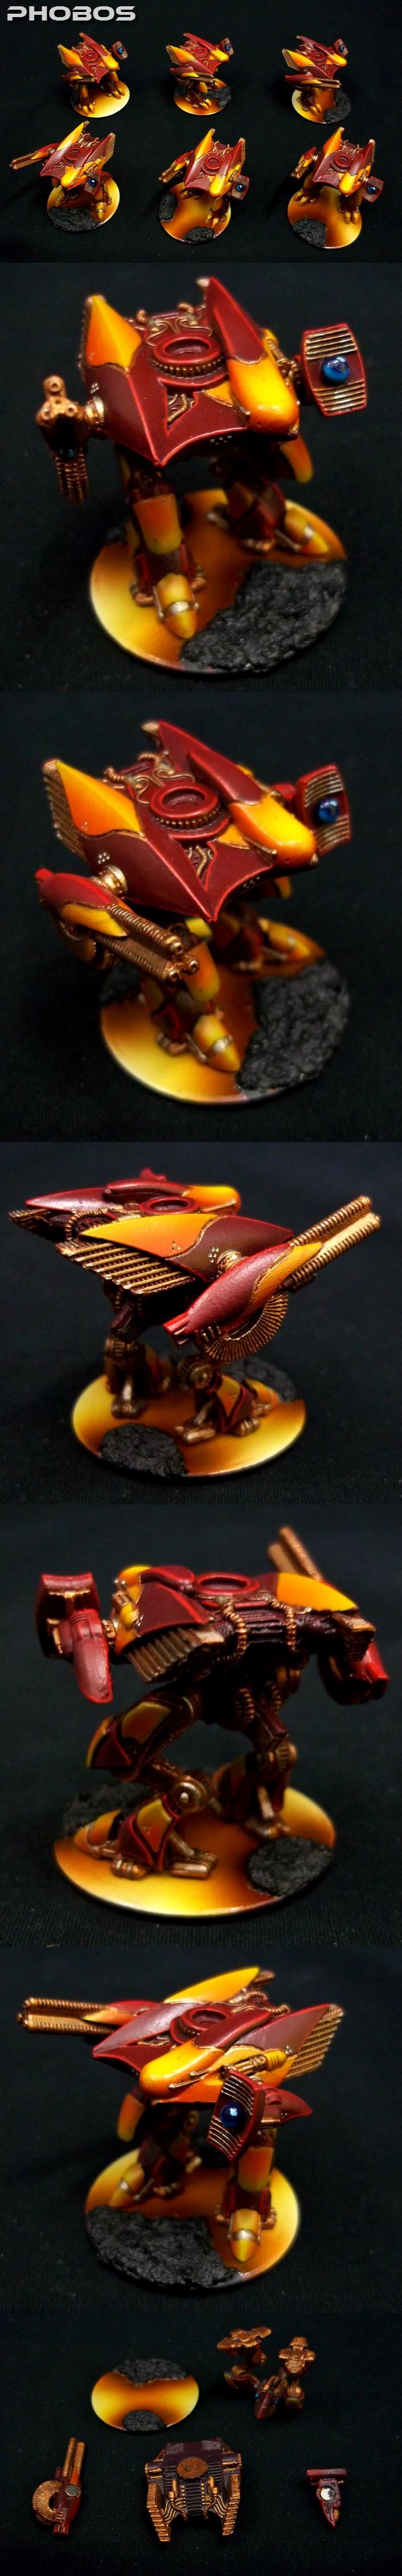 Dropzone Commander, Dzc, Fire, Lava, Phobos, Phr, Post Human Republic, Walker